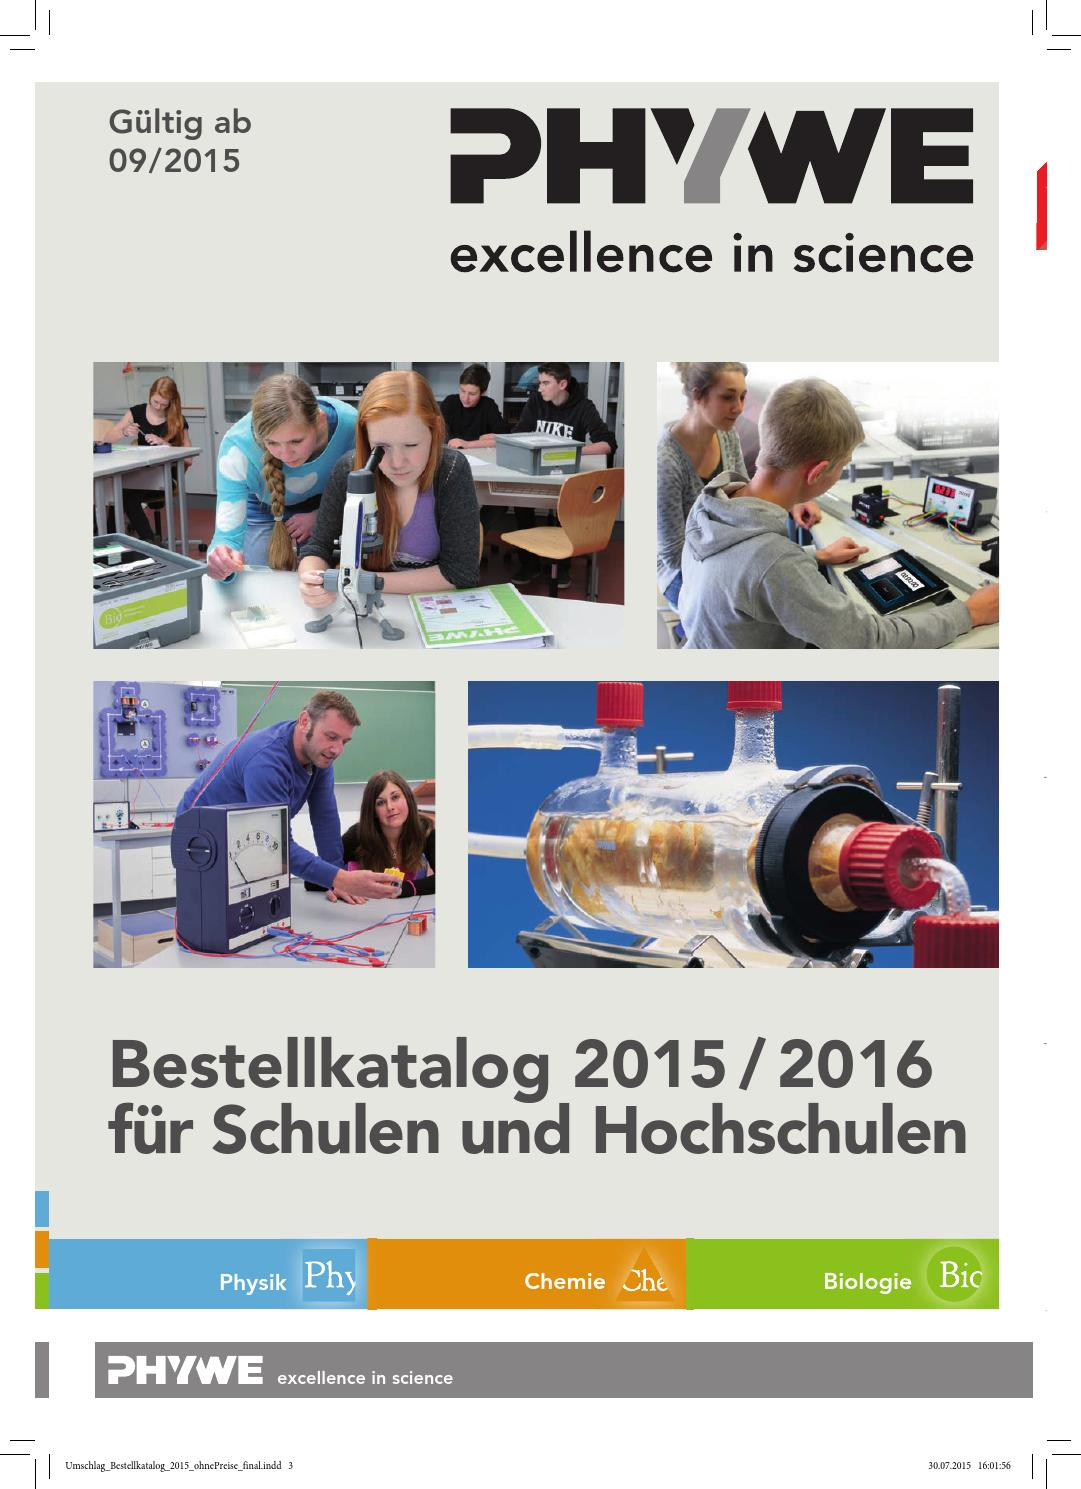 PHYWE Bestellkatalog 2015 - 2016 Biologie - Basisgeräte by PHYWE ...